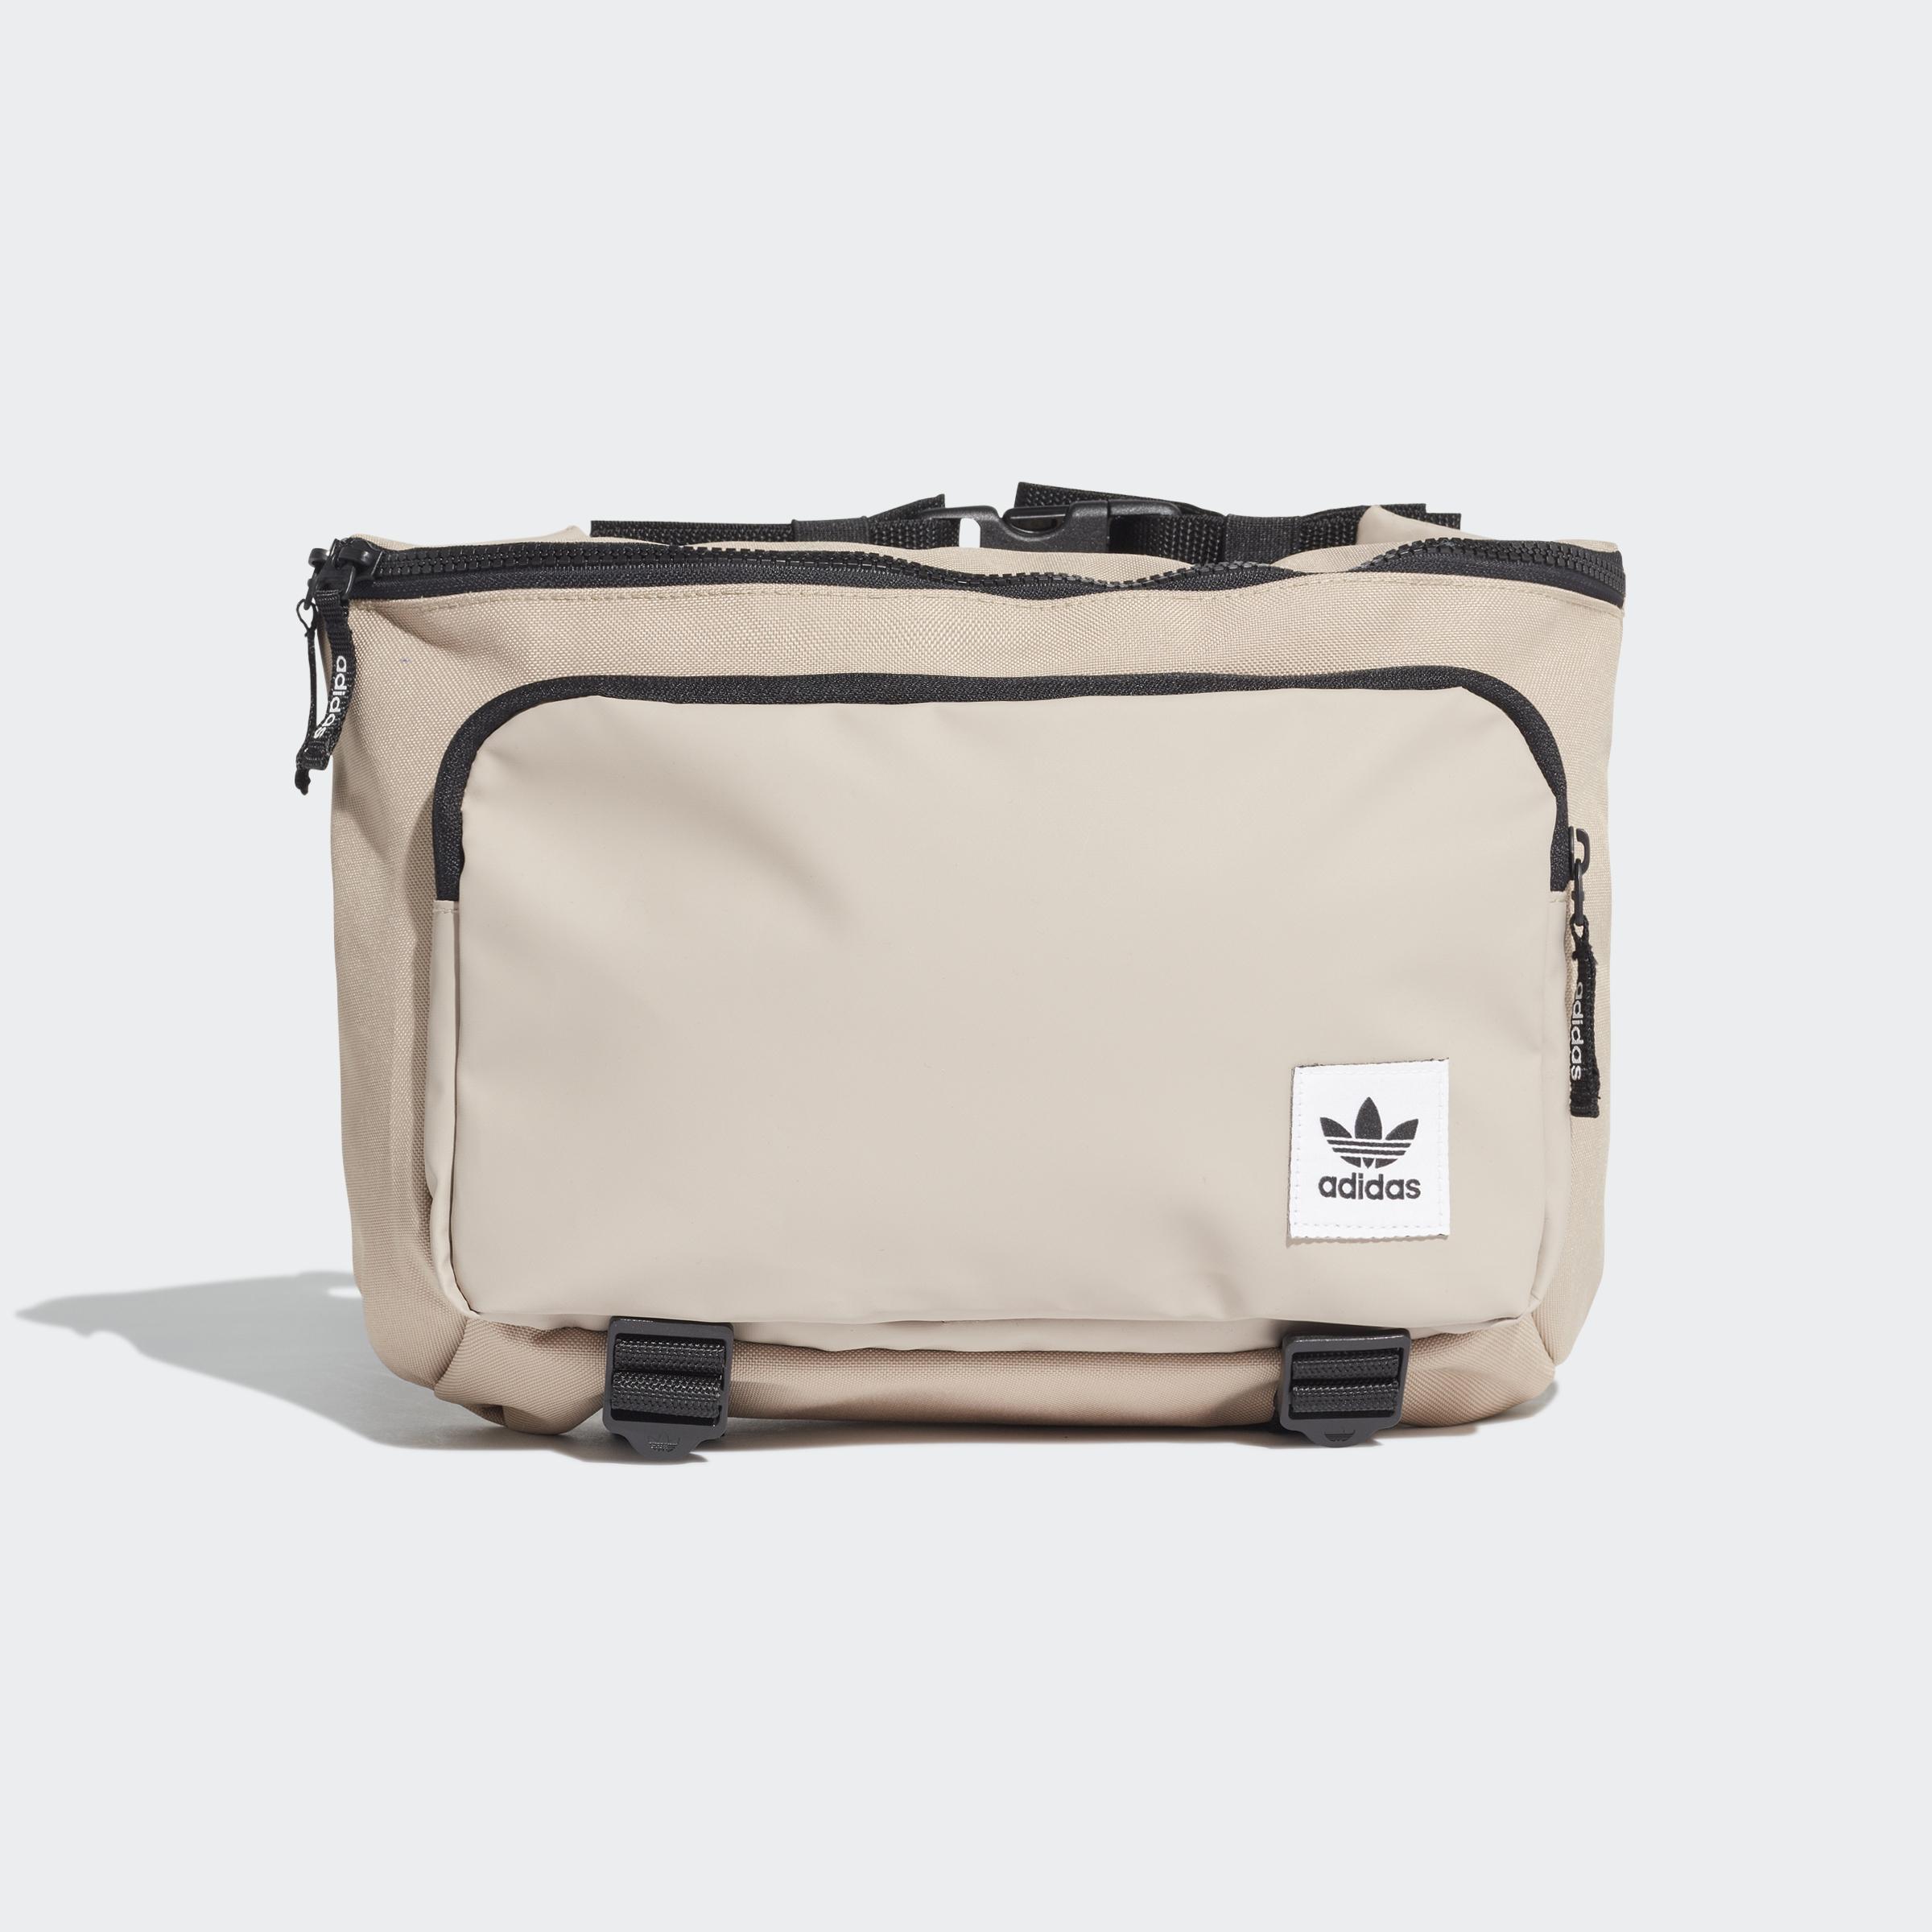 adidas-Premium-Essentials-Waist-Bag-Large-Bags thumbnail 15